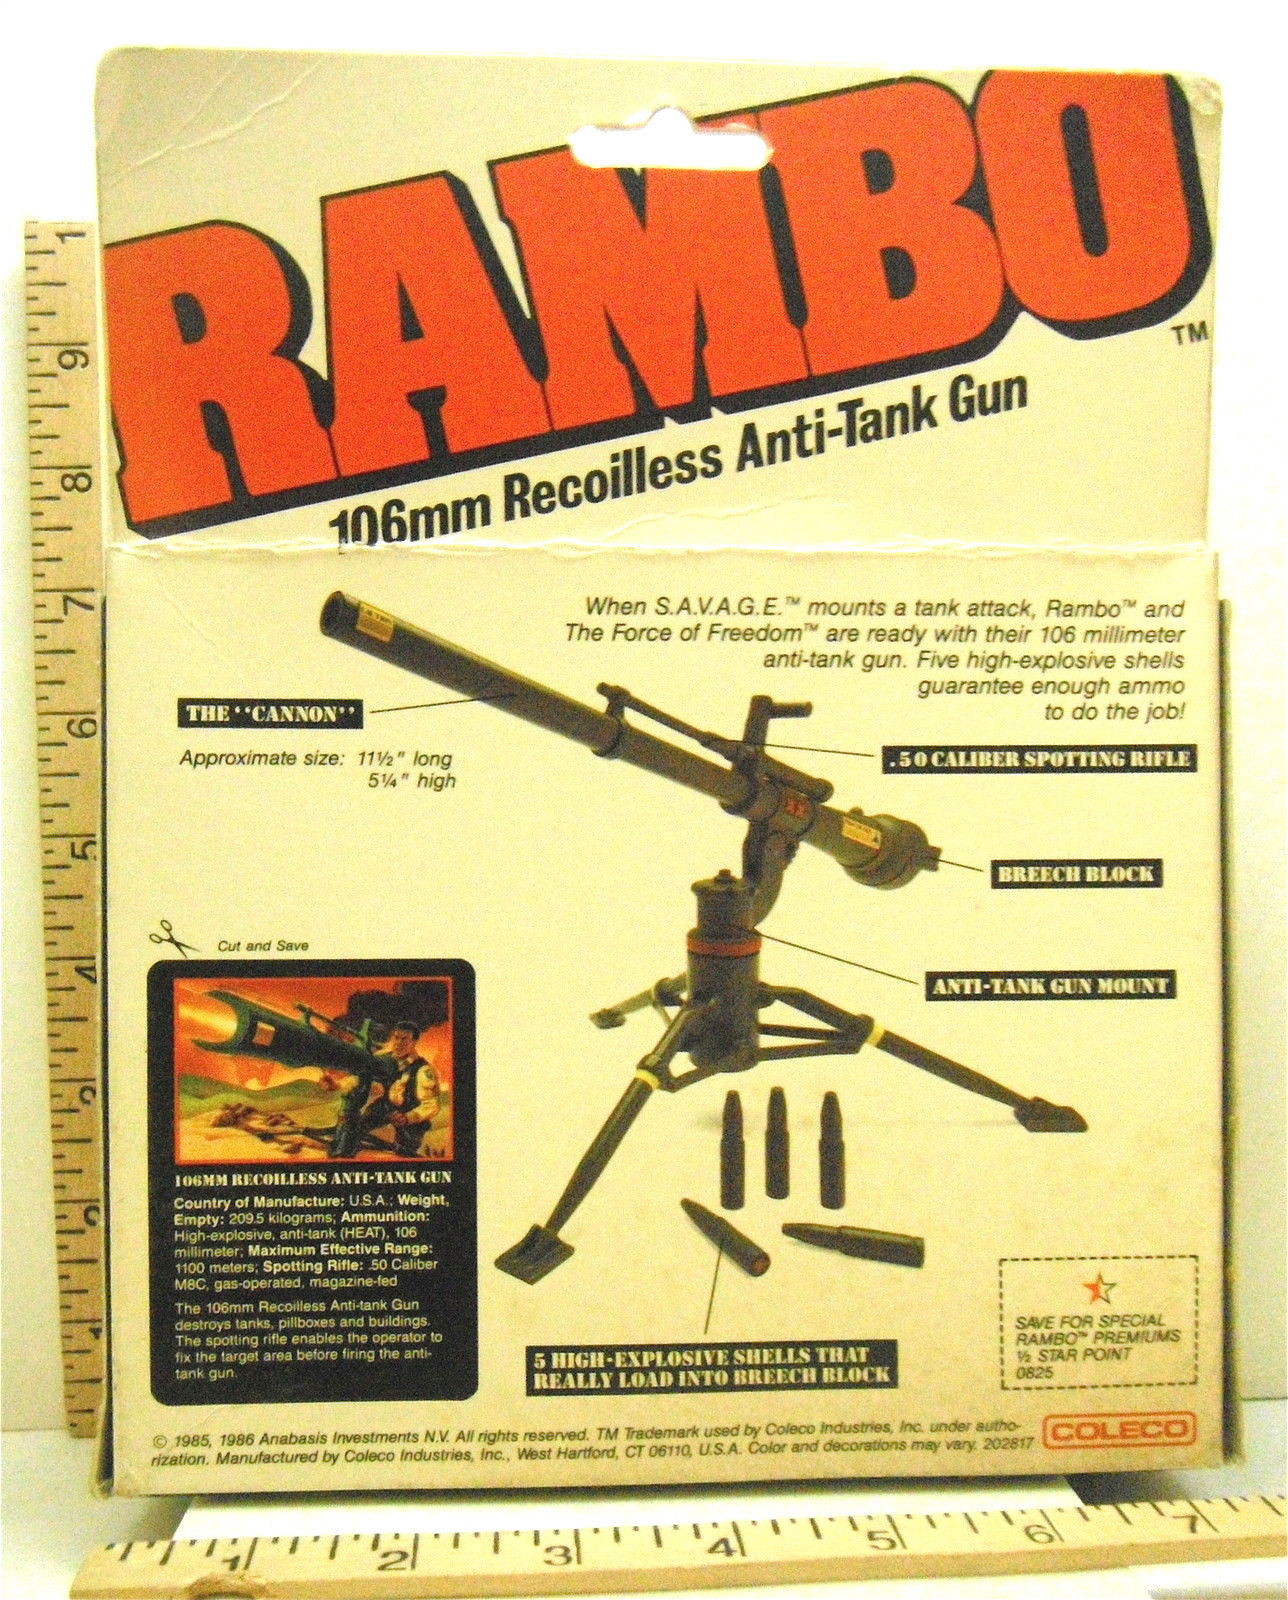 1986 Coleco Rambo 106mm Recoilless Anti Tank Gun Sealed Box